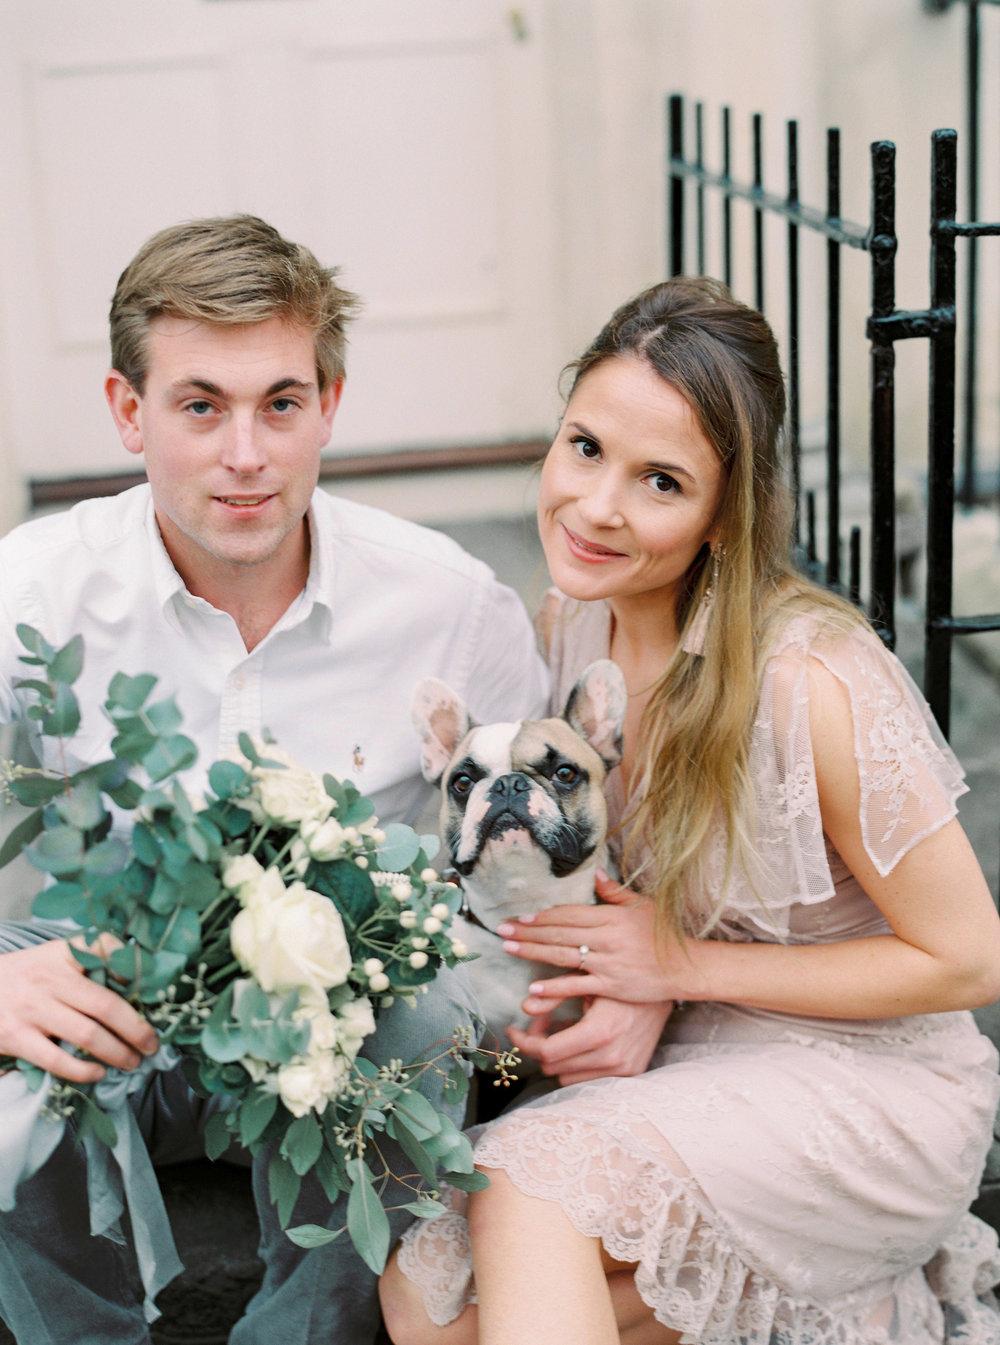 Luxury Wedding Planner UK | Our Chic & Romantic Engagement Shoot in Bath | Katie Julia Photography - 30.JPG